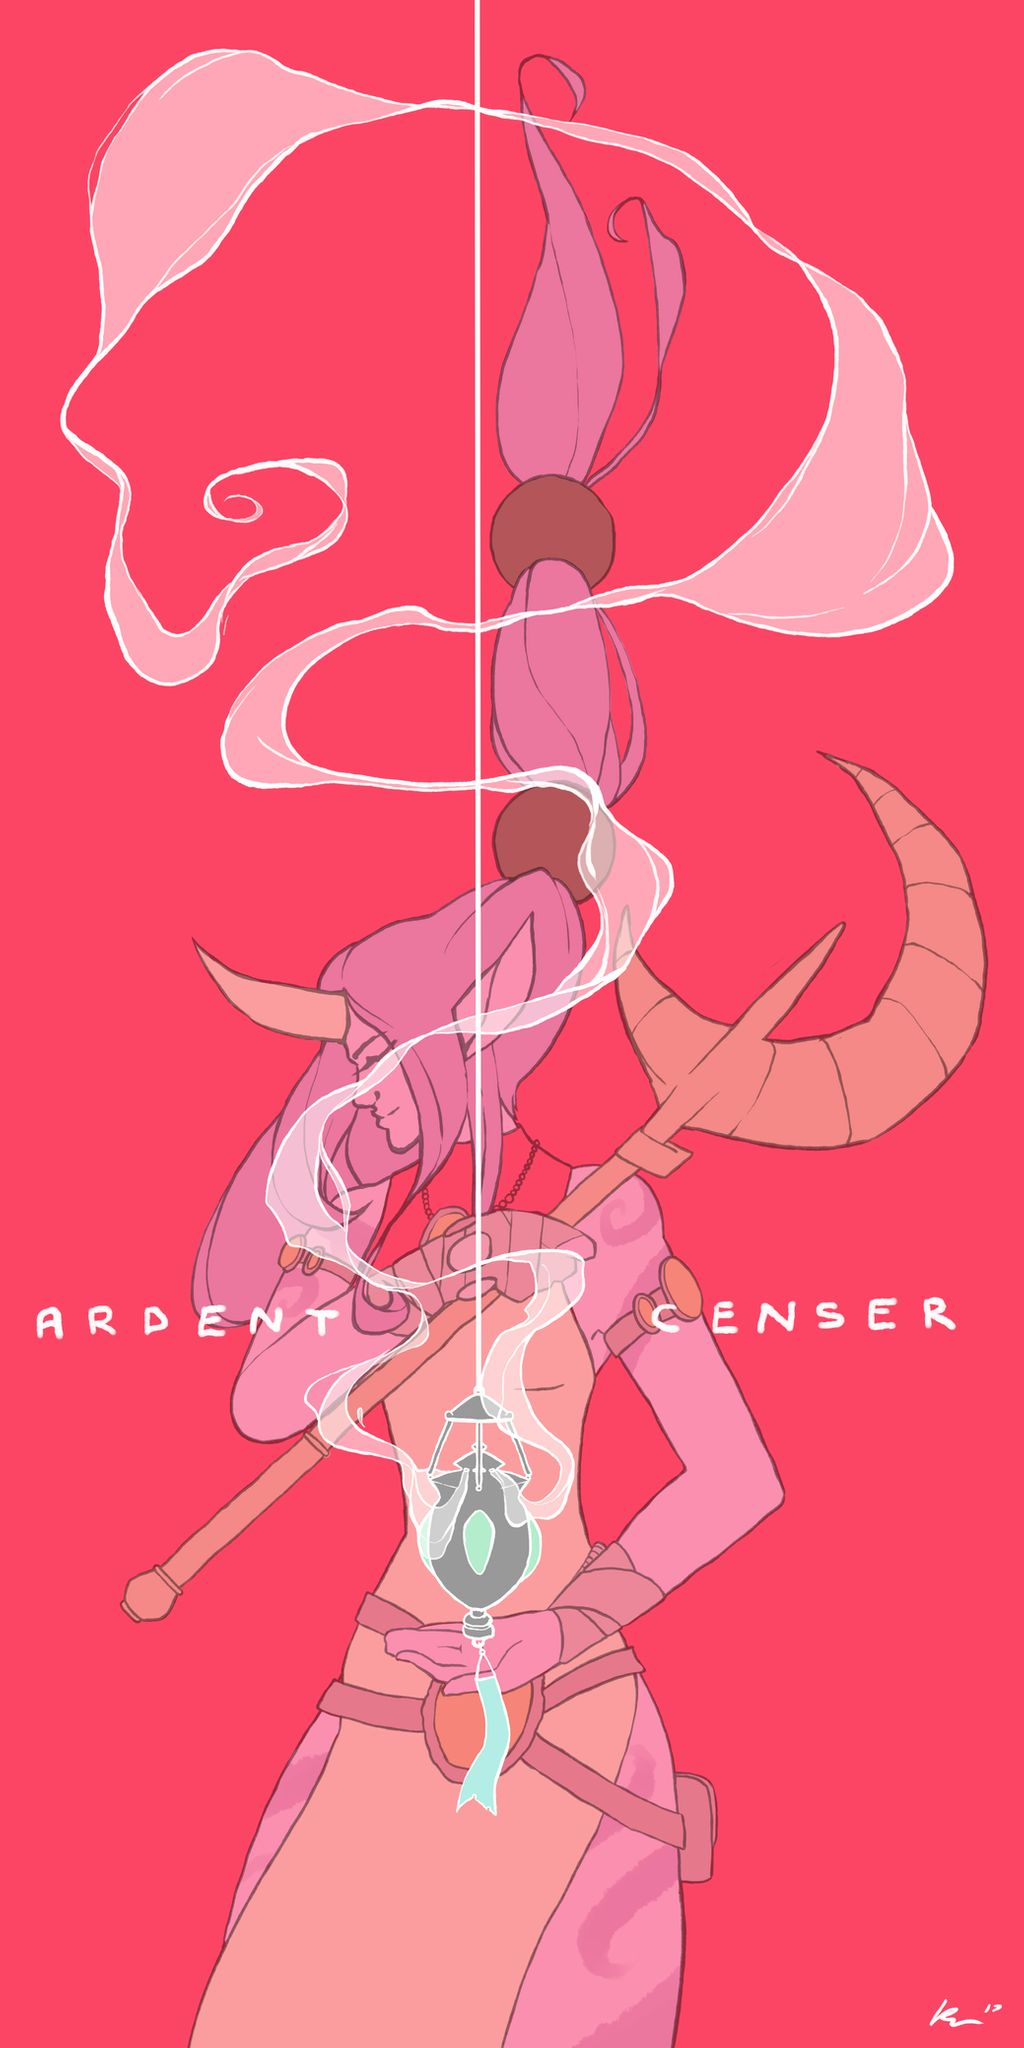 league of legends ardent censer